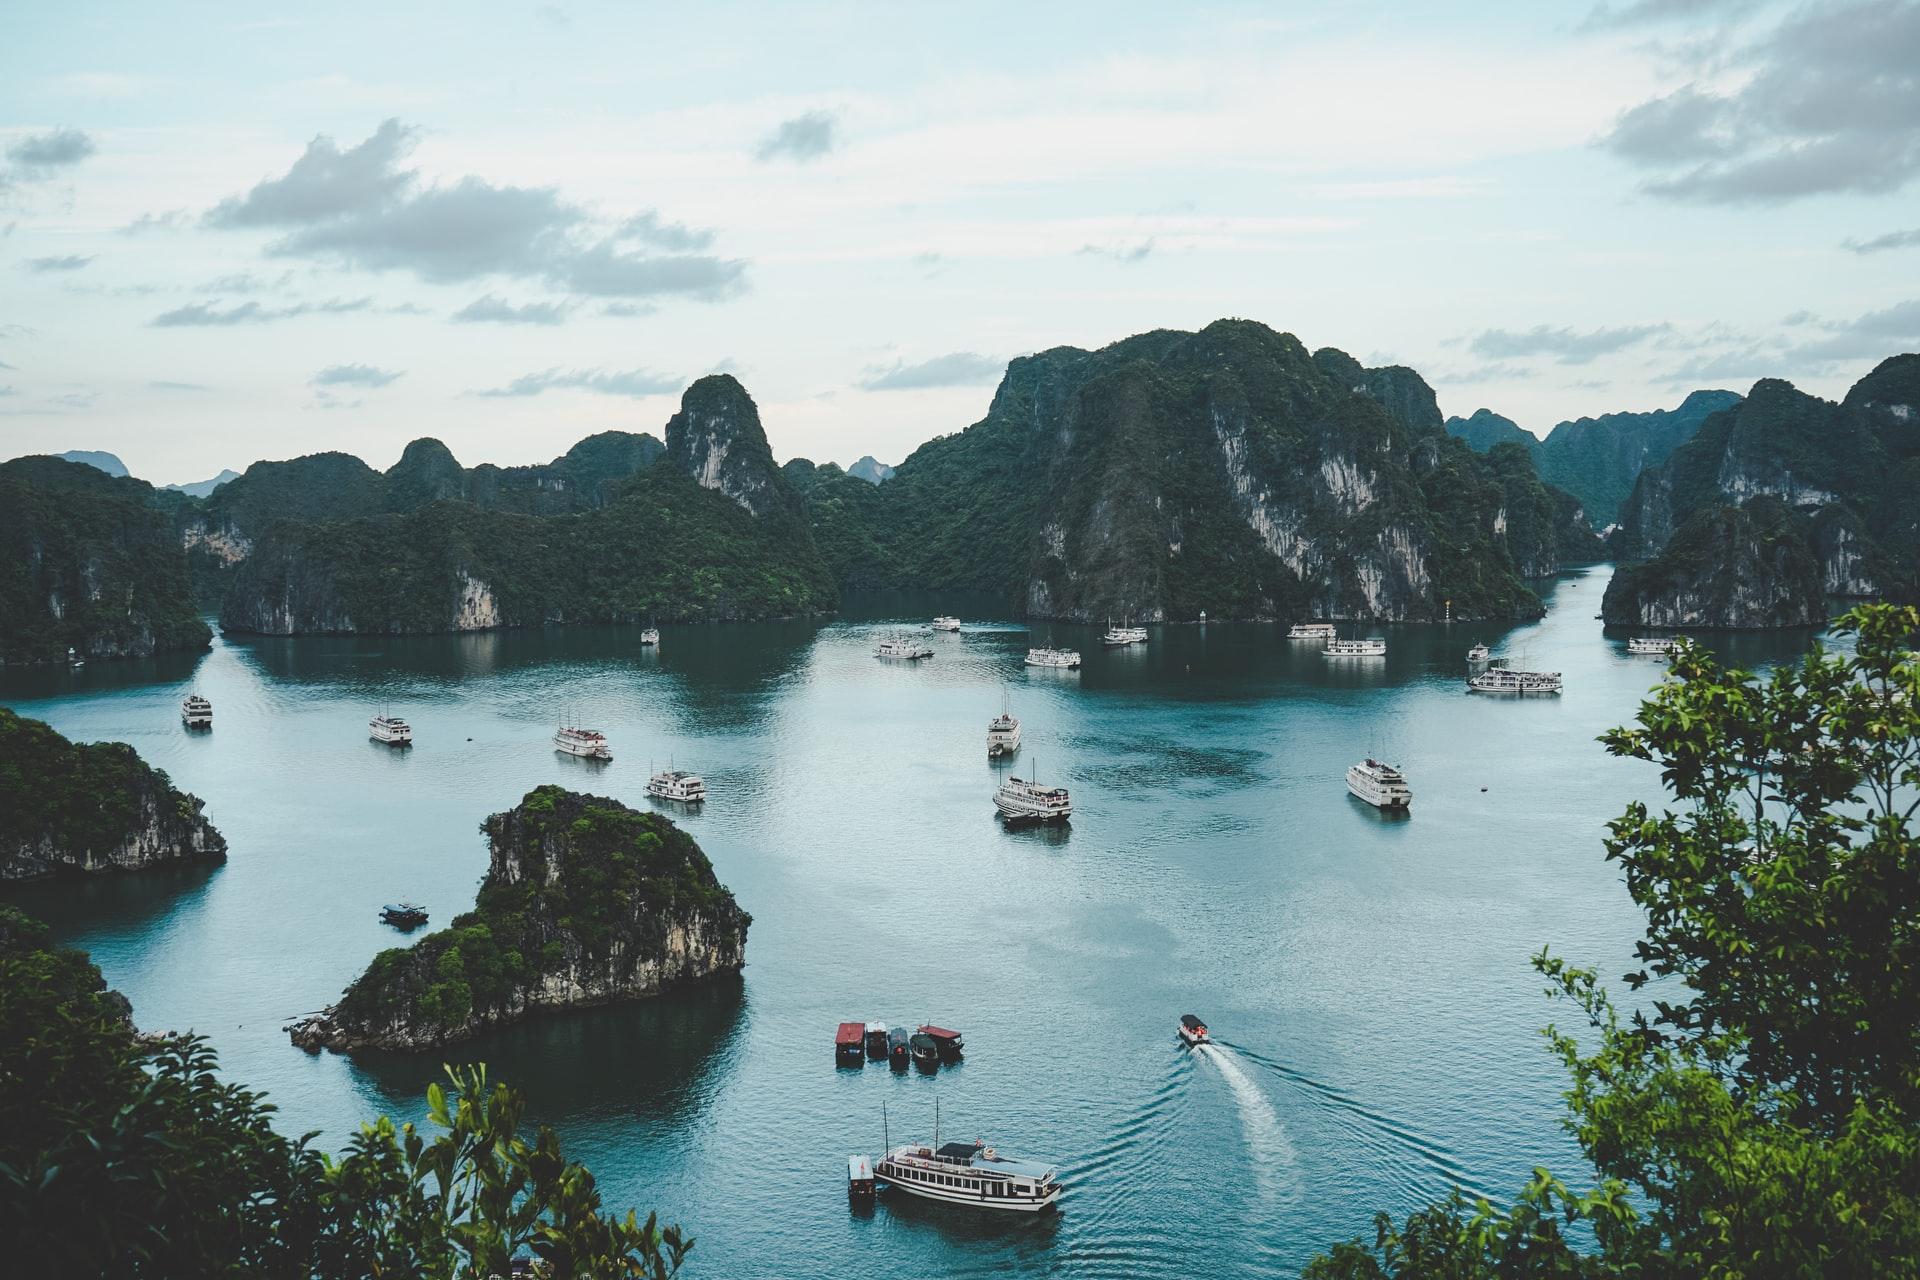 Hạ Long, Vietnam tours with Trafalgar